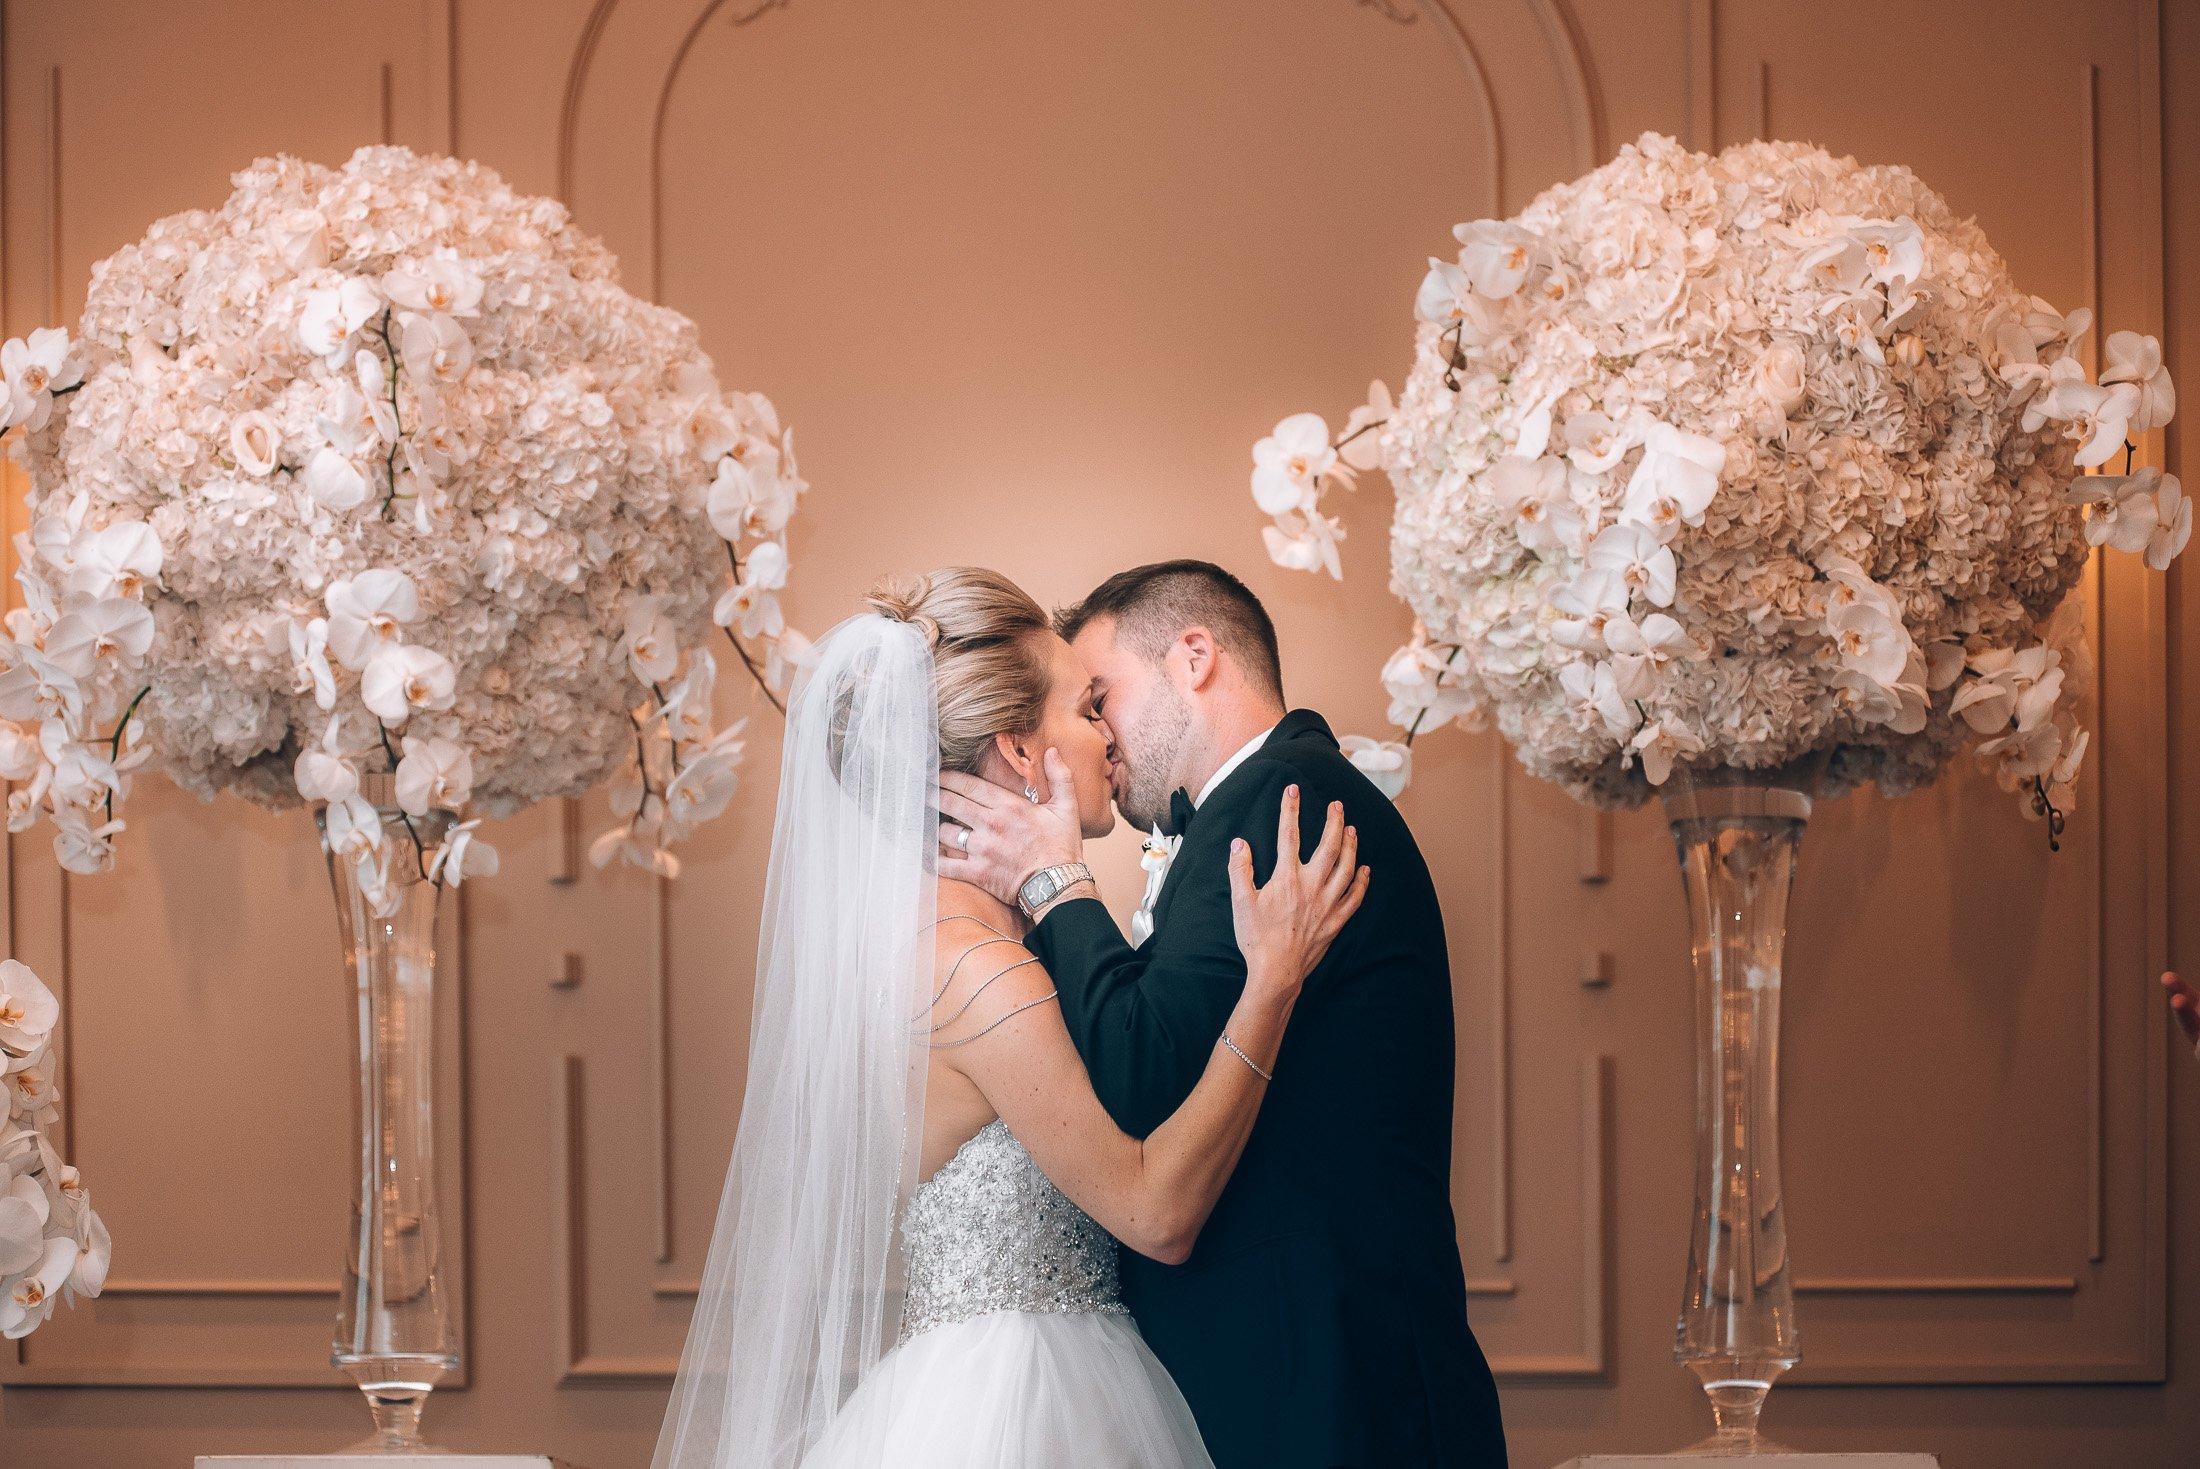 Indoor Wedding: Terminal City Club And Vancouver Art Gallery Wedding